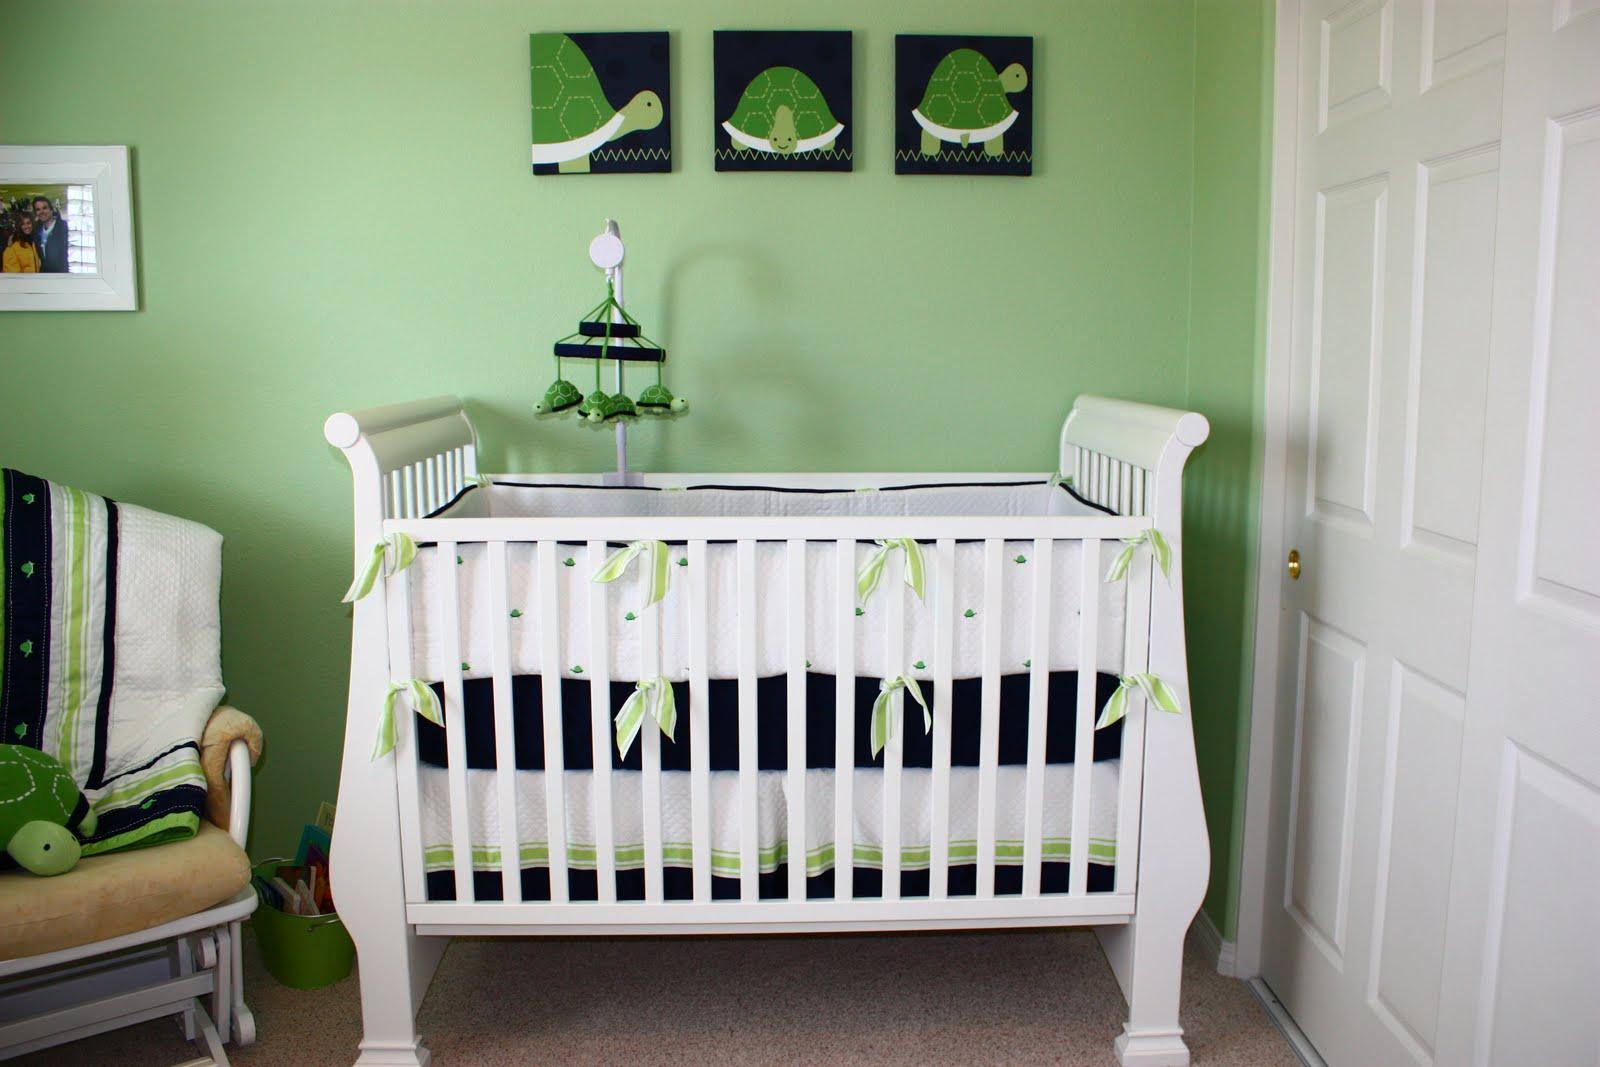 green baby furniture. Kole\u0027s Nursery Green Baby Furniture E